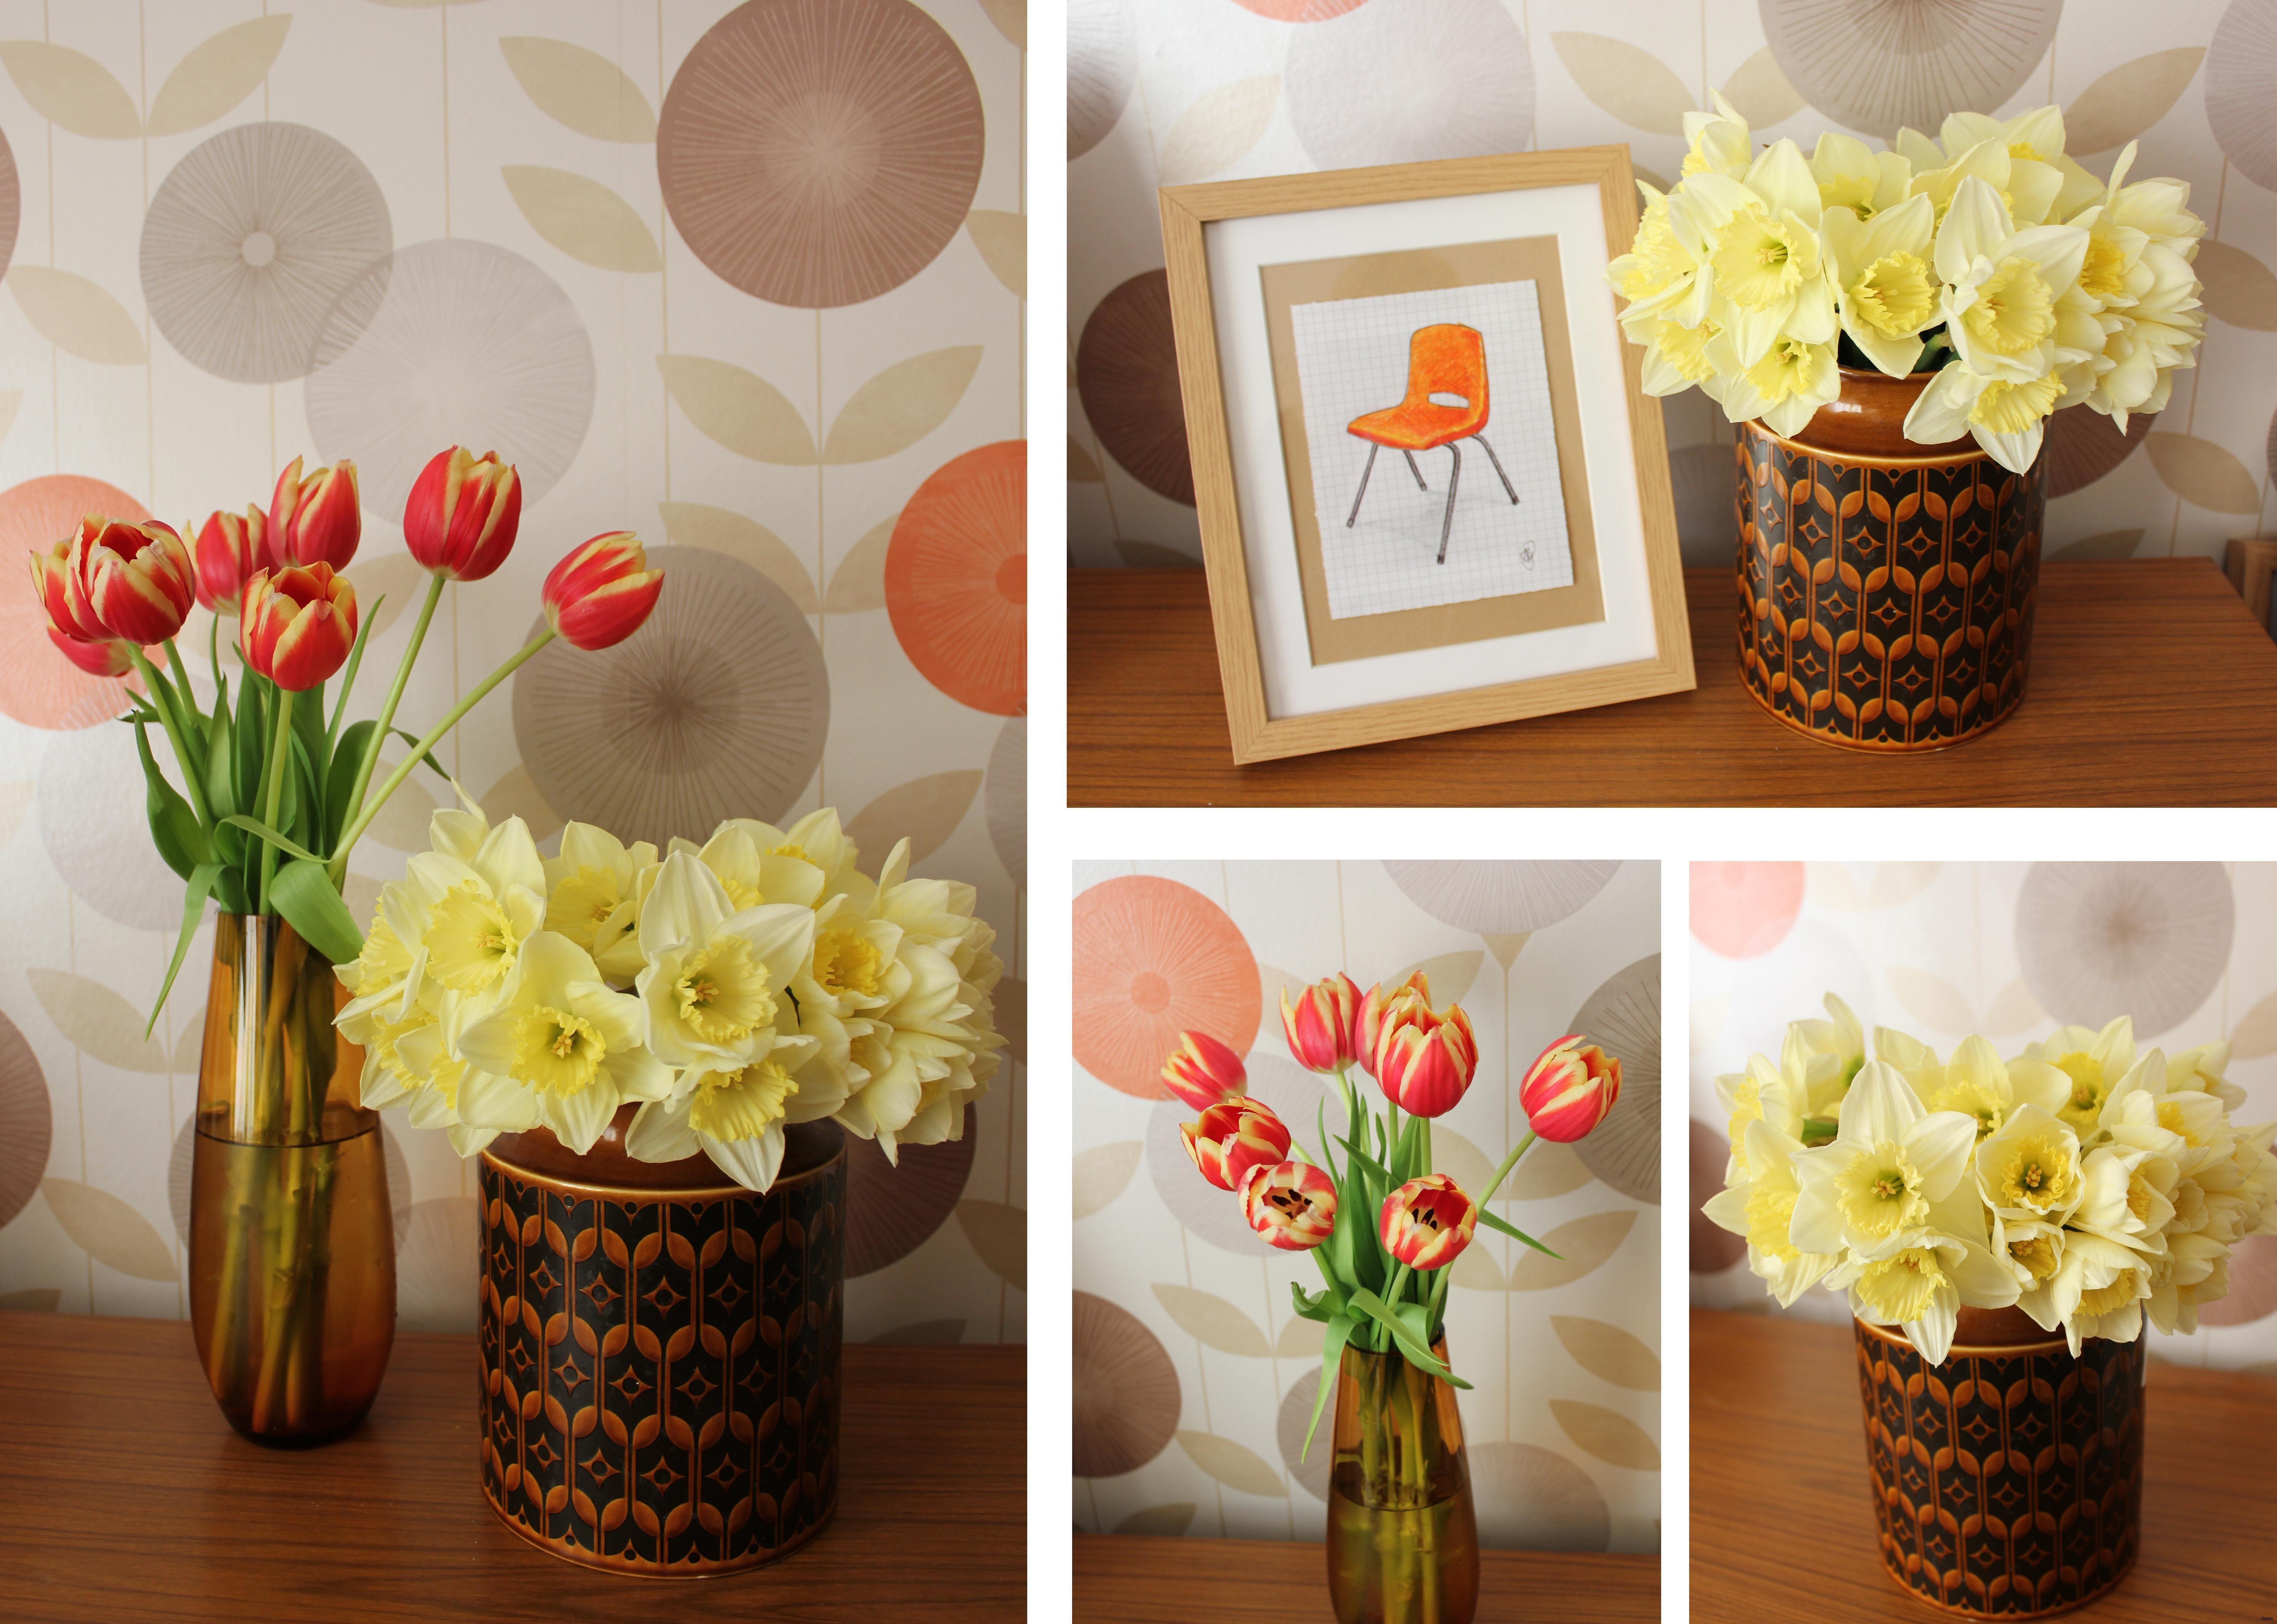 Happy Birthday Banner Diy New Diy Home Decor Vaseh Vases Decorative Flower Ideas I 0d Design